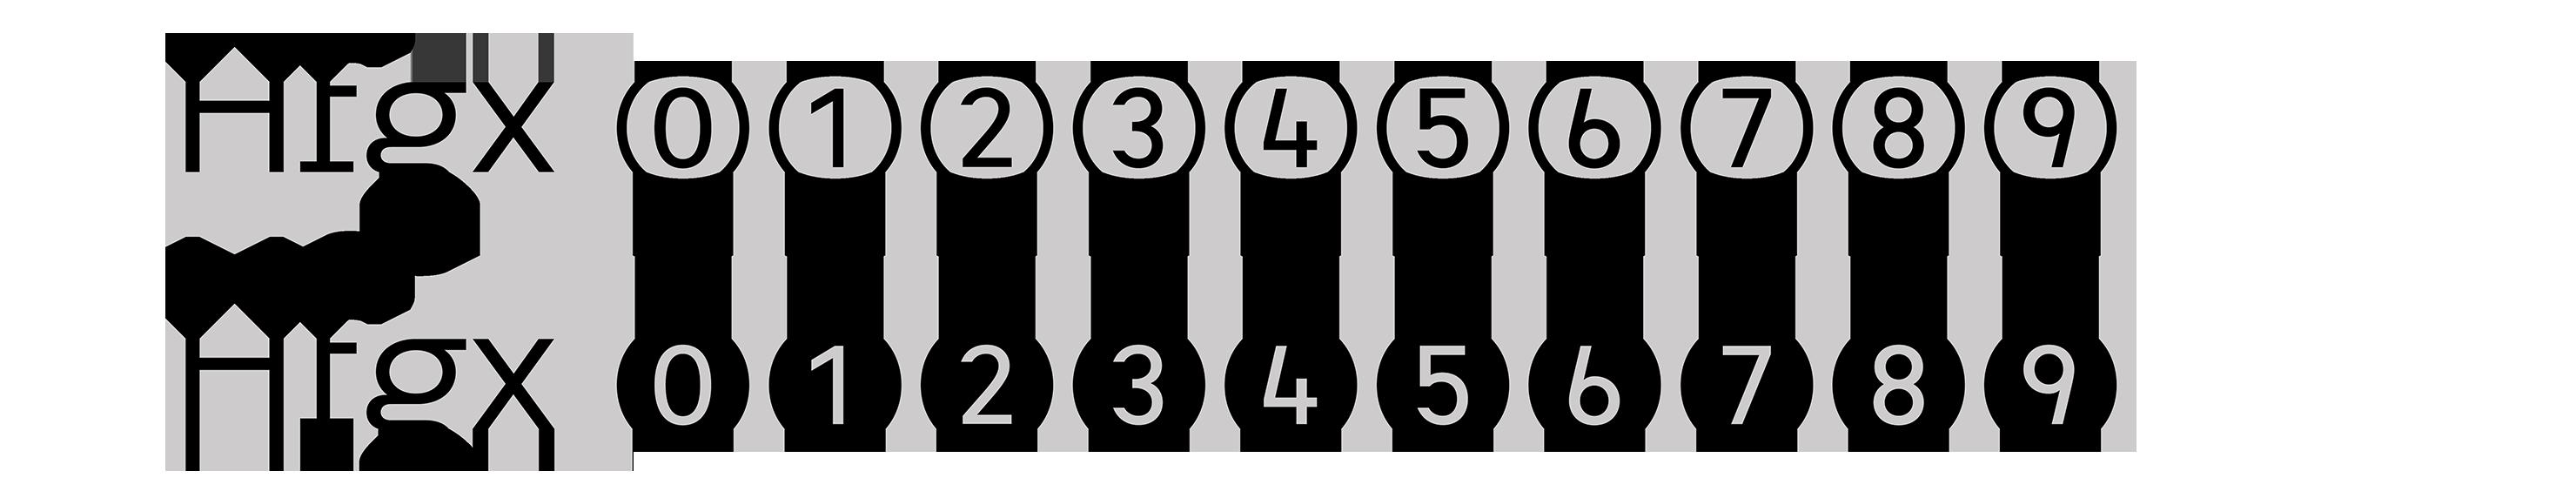 Typeface-Heimat-Sans-F17-Atlas-Font-Foundry